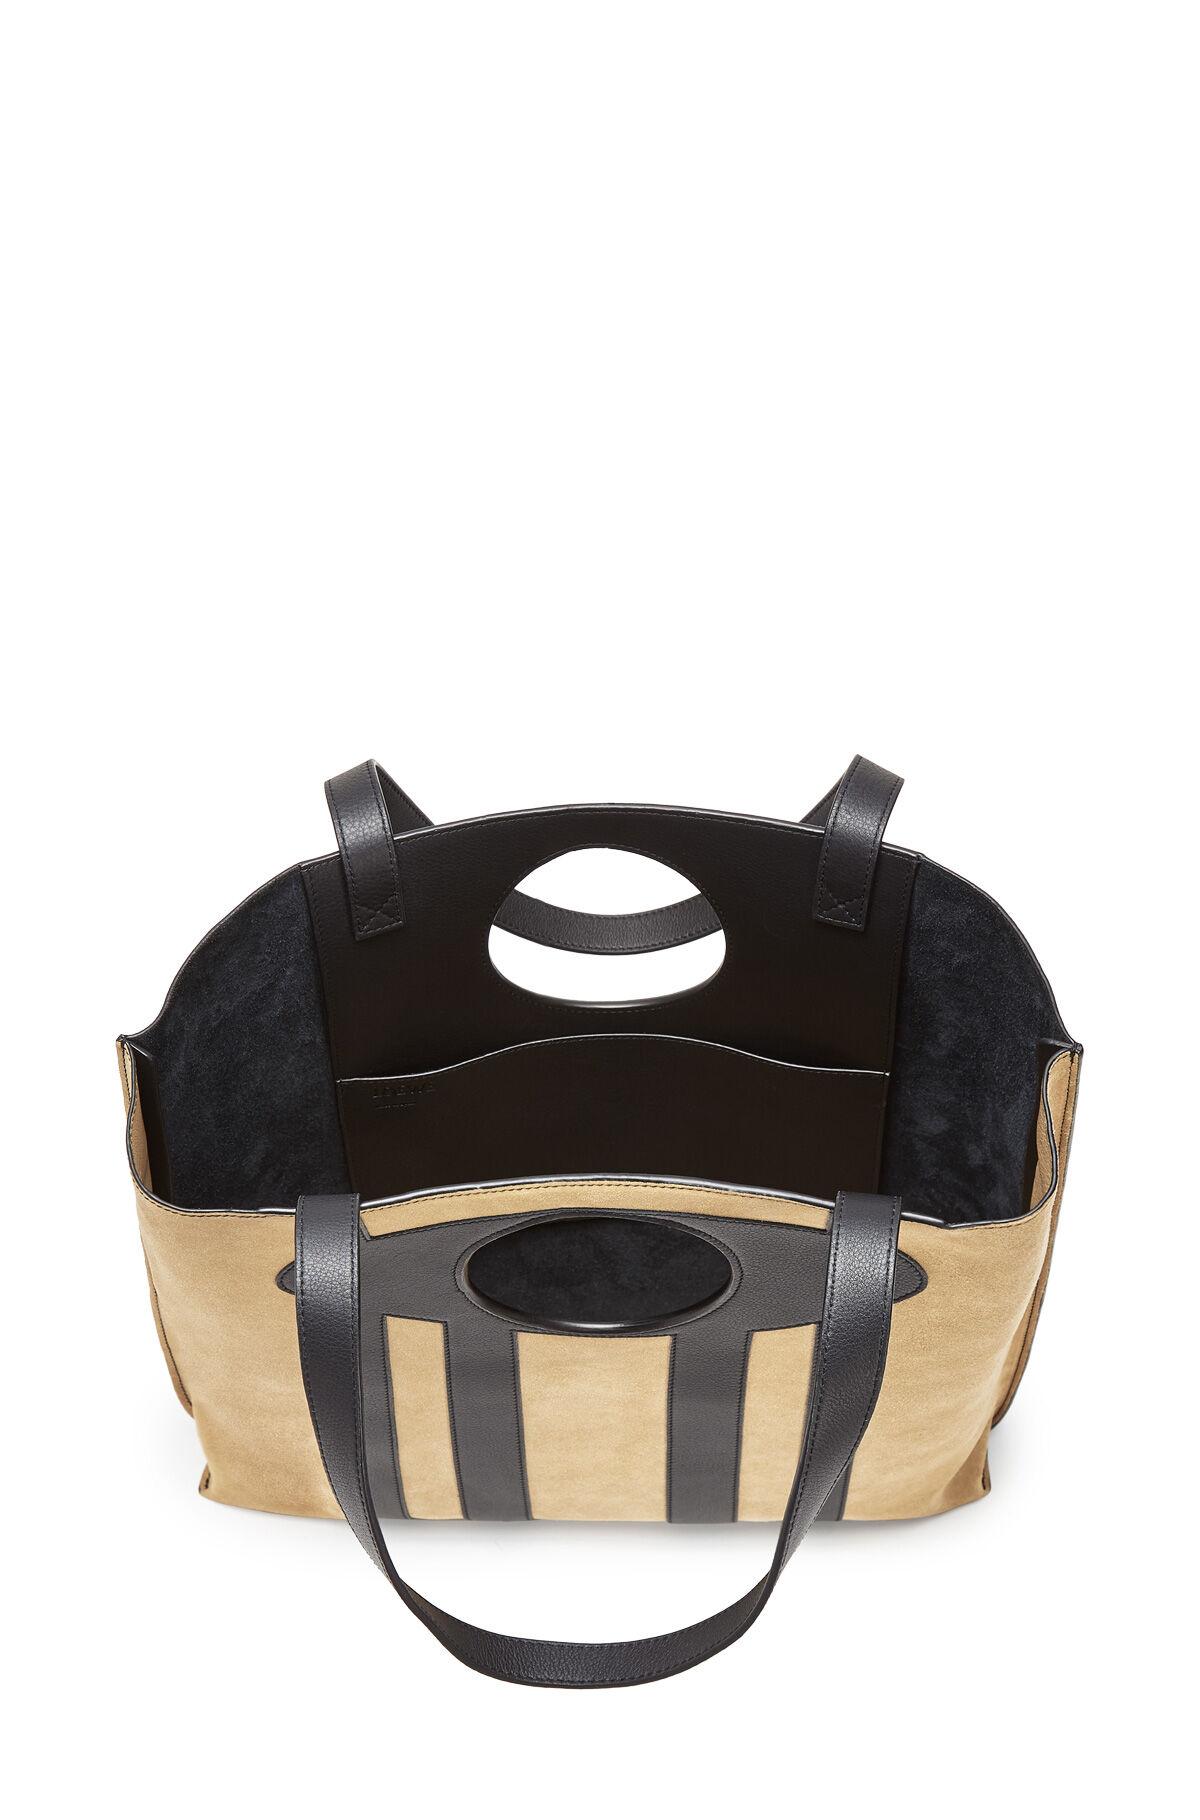 LOEWE Chair Tote Bag 金色/黑色 all